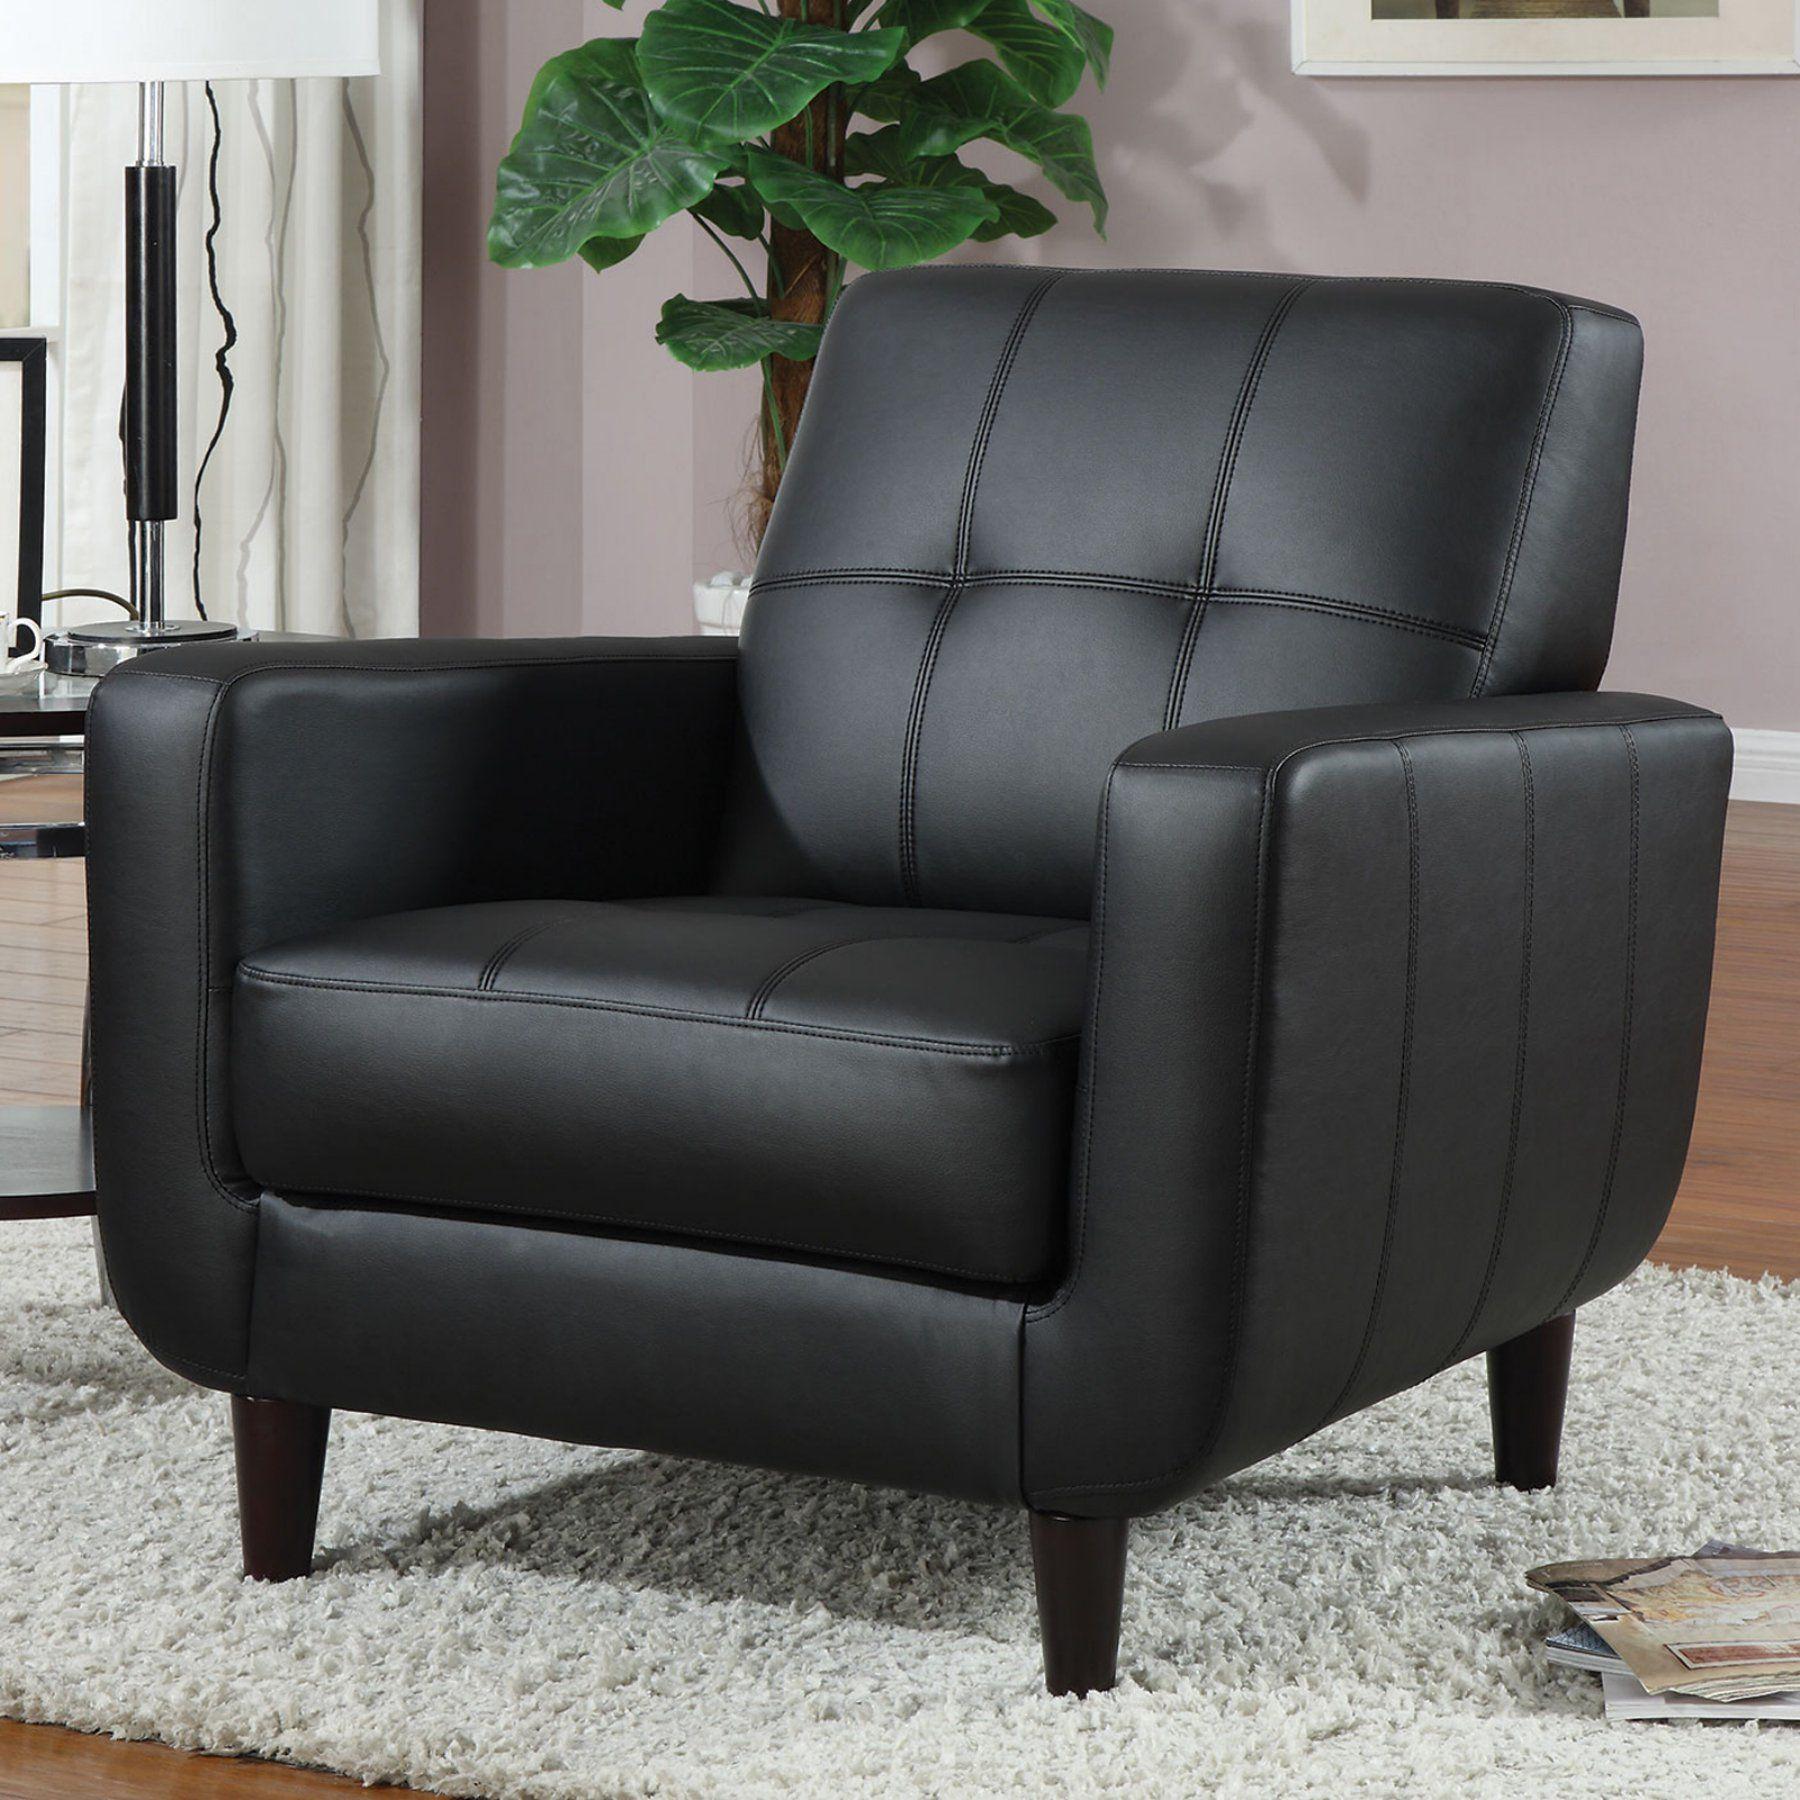 Coaster Furniture Chico Club Chair - 900204